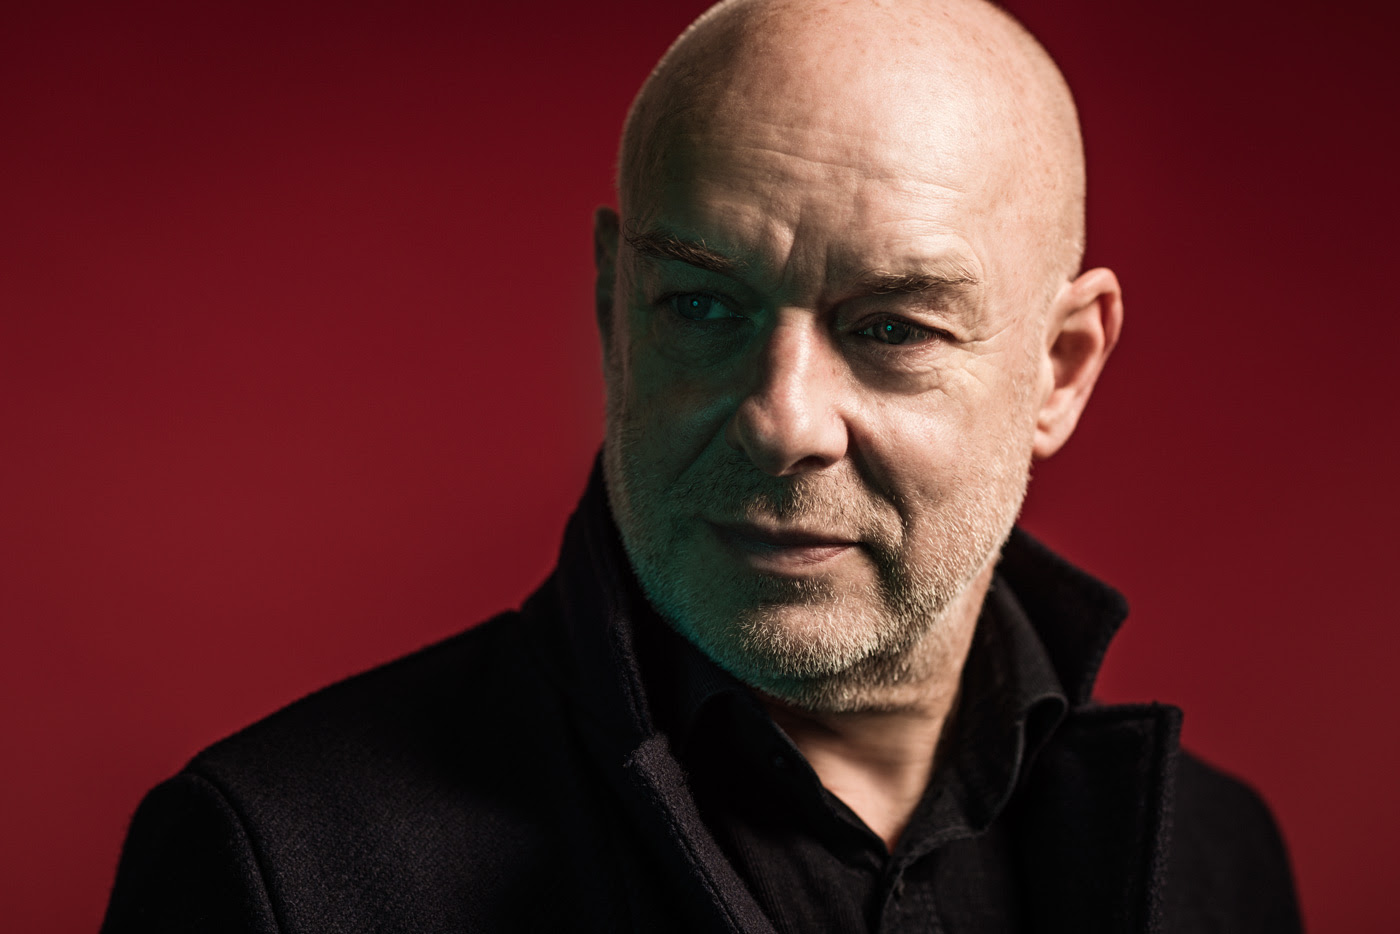 10 Essential Albums produced by Brian Eno